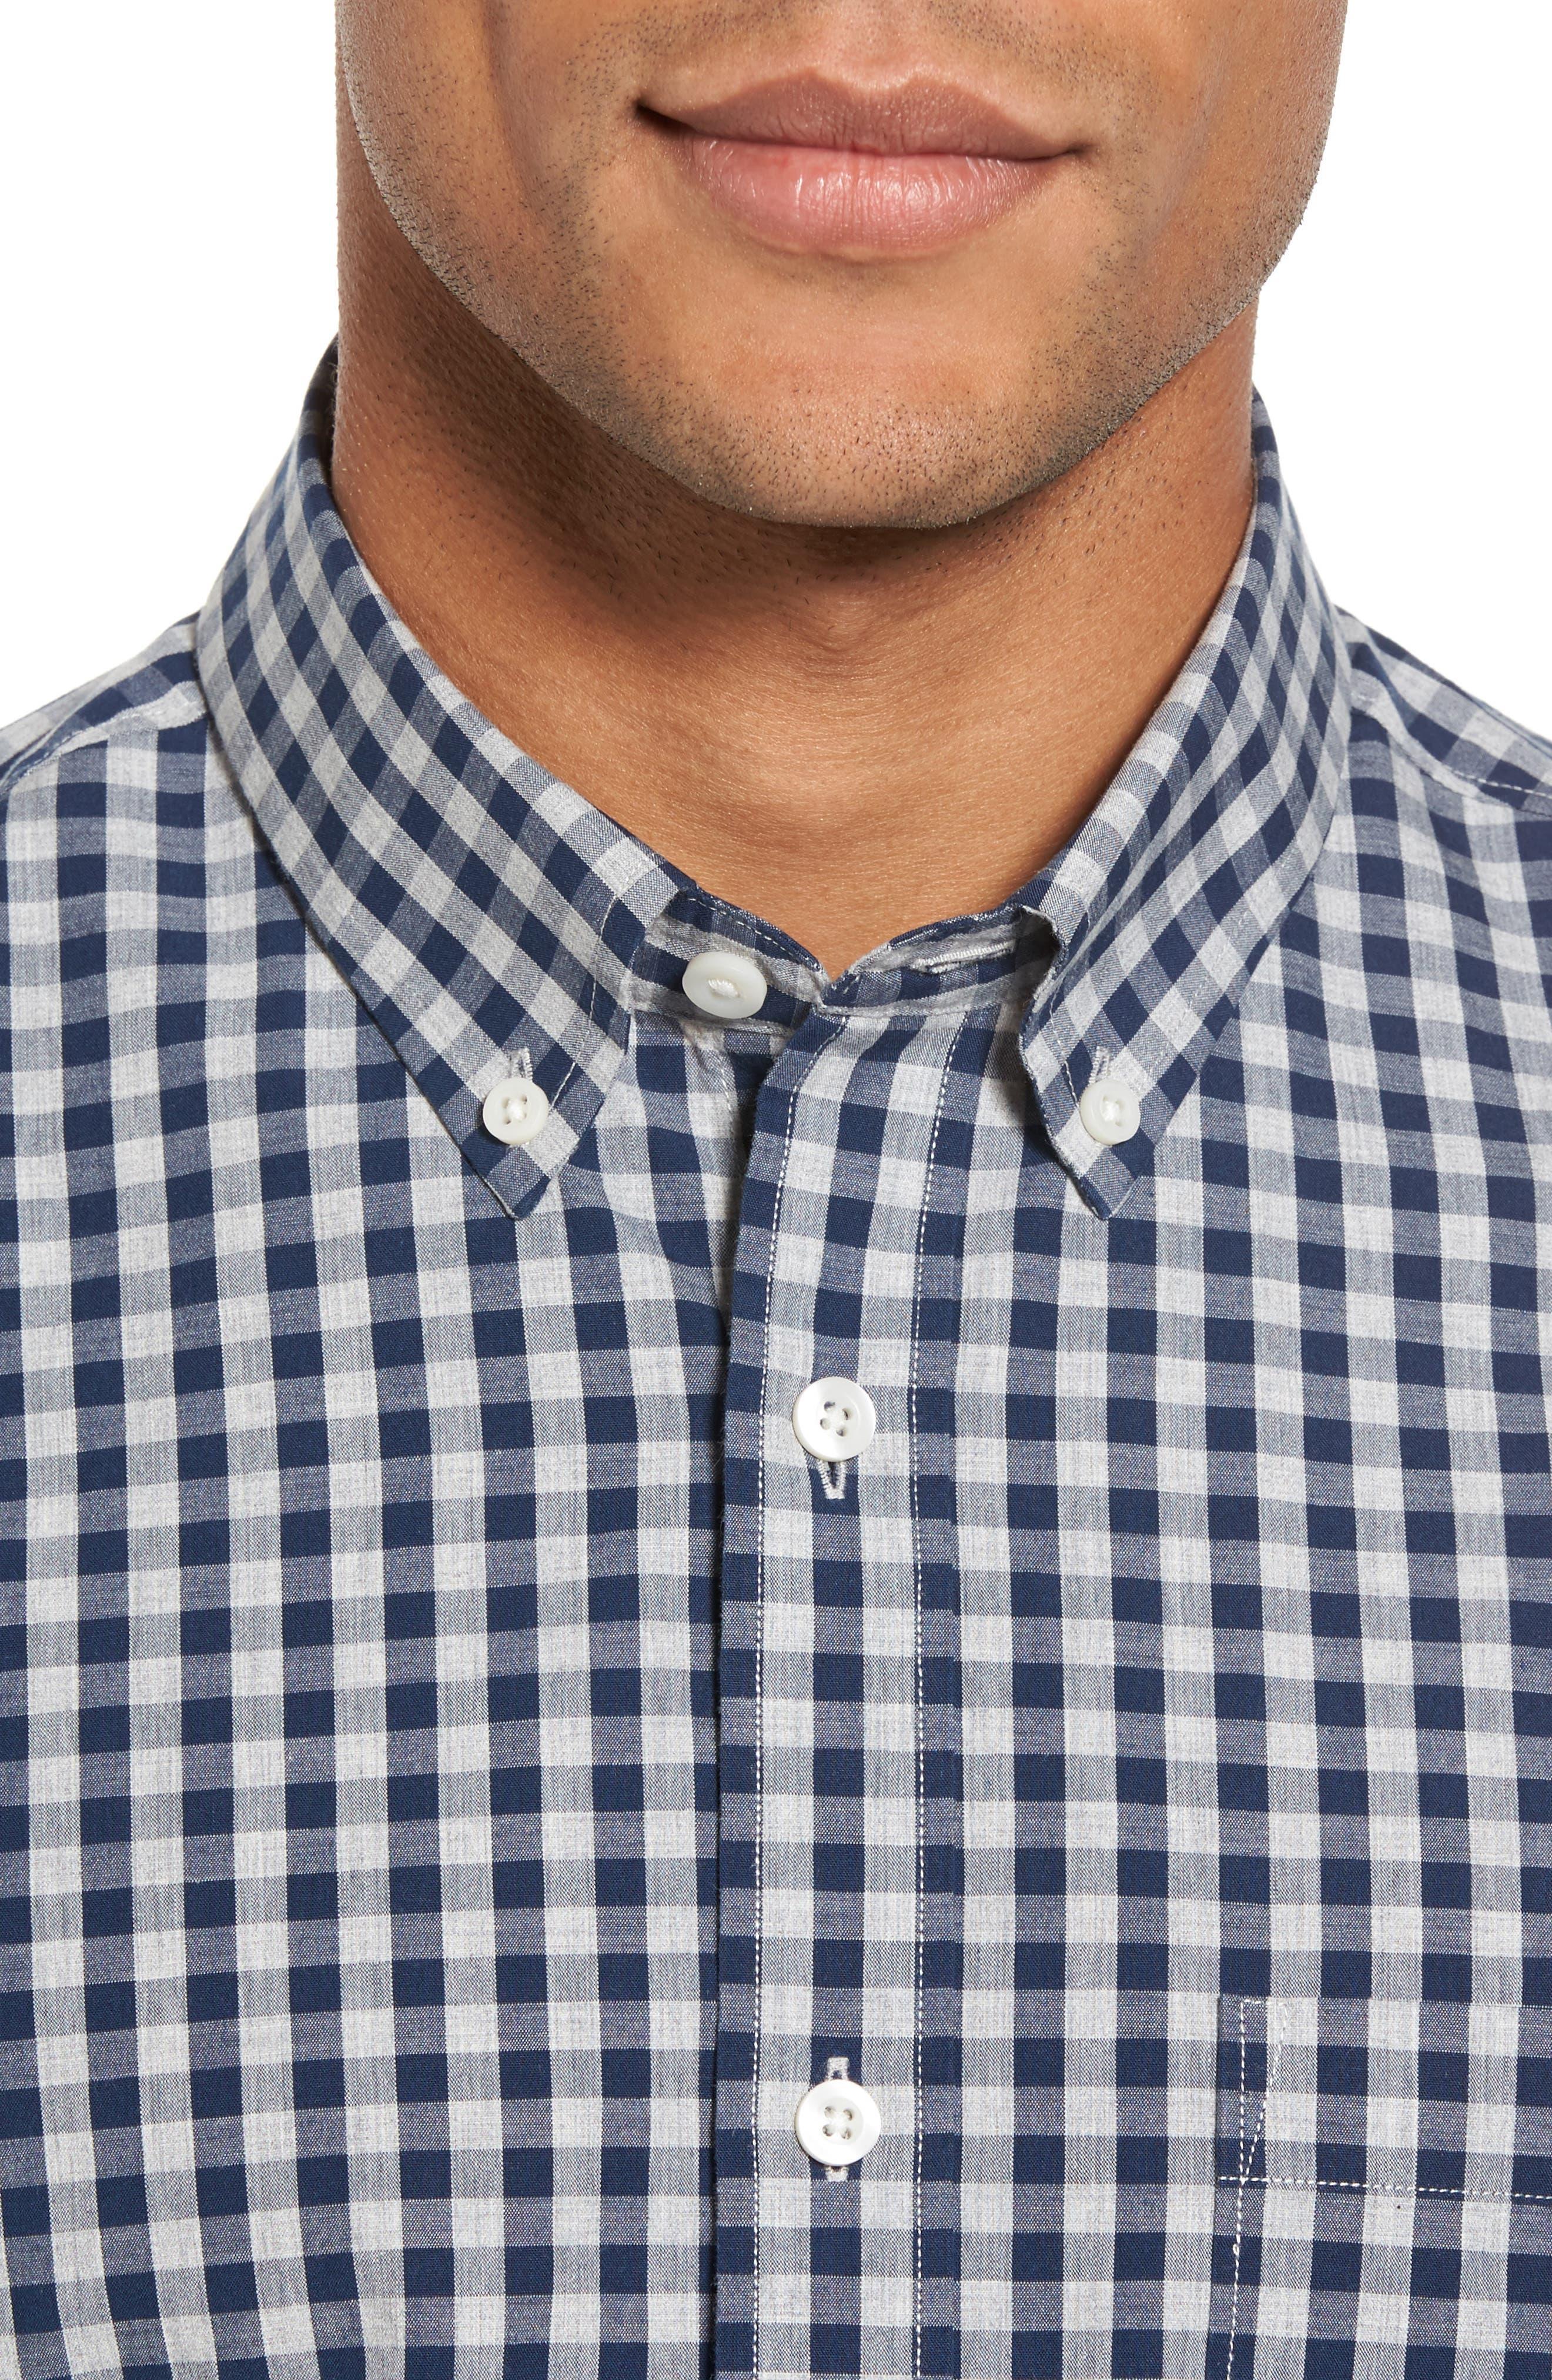 Spade Trim Fit Gingham Check Sport Shirt,                             Alternate thumbnail 2, color,                             Grey Shade Navy Gingham